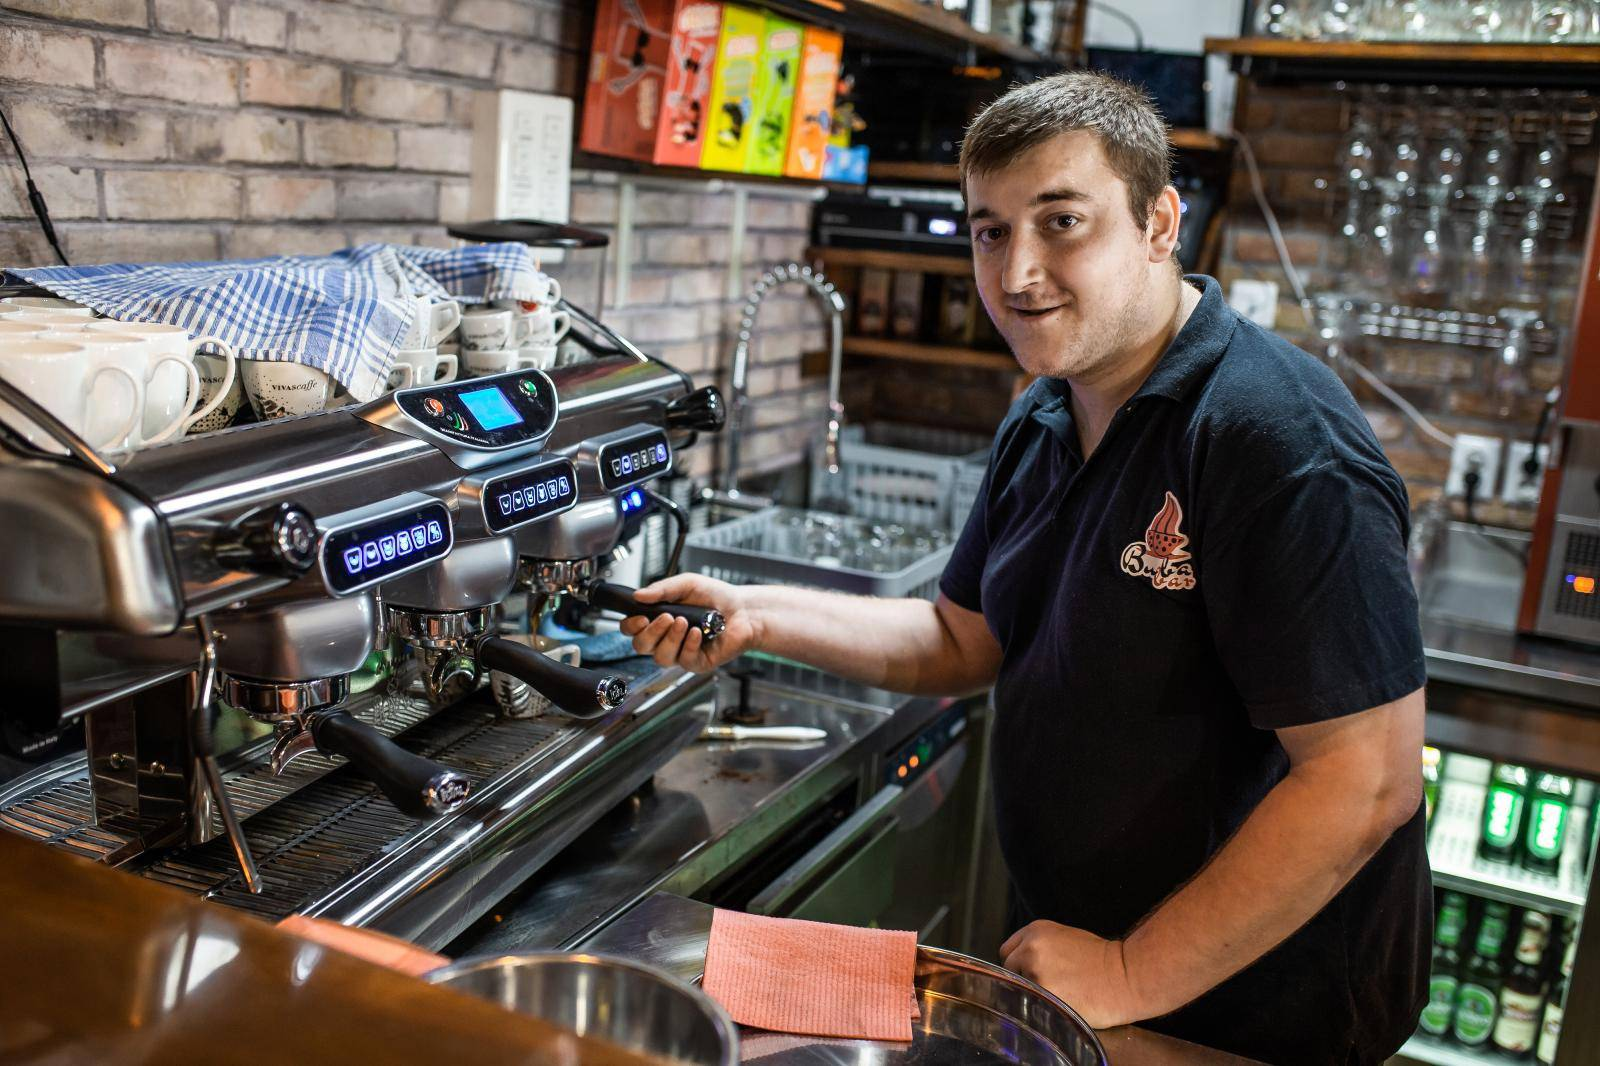 Vinkovci: Buba bar zapošljava konobare s invaliditetom, pretežito sa sindromom Down